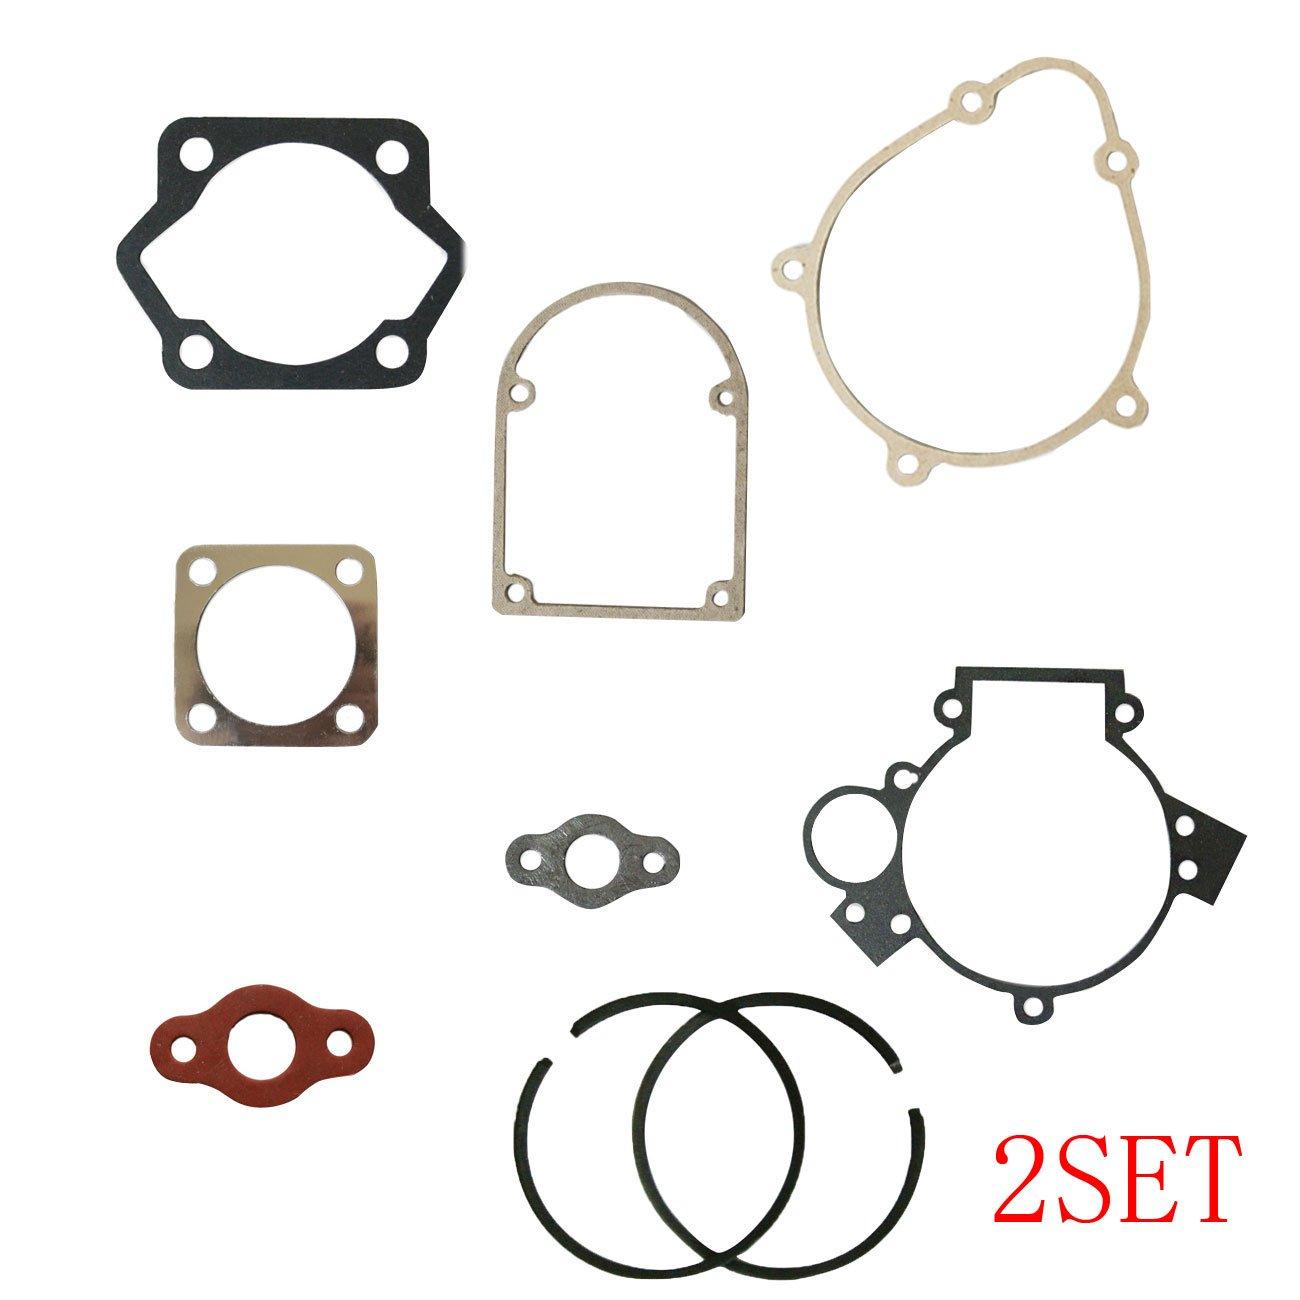 New 2x Gasket Kit & 4xPistion Rings Fit 80cc Motorized Bicycle Bike Motor JL JIANGLI LEGEND